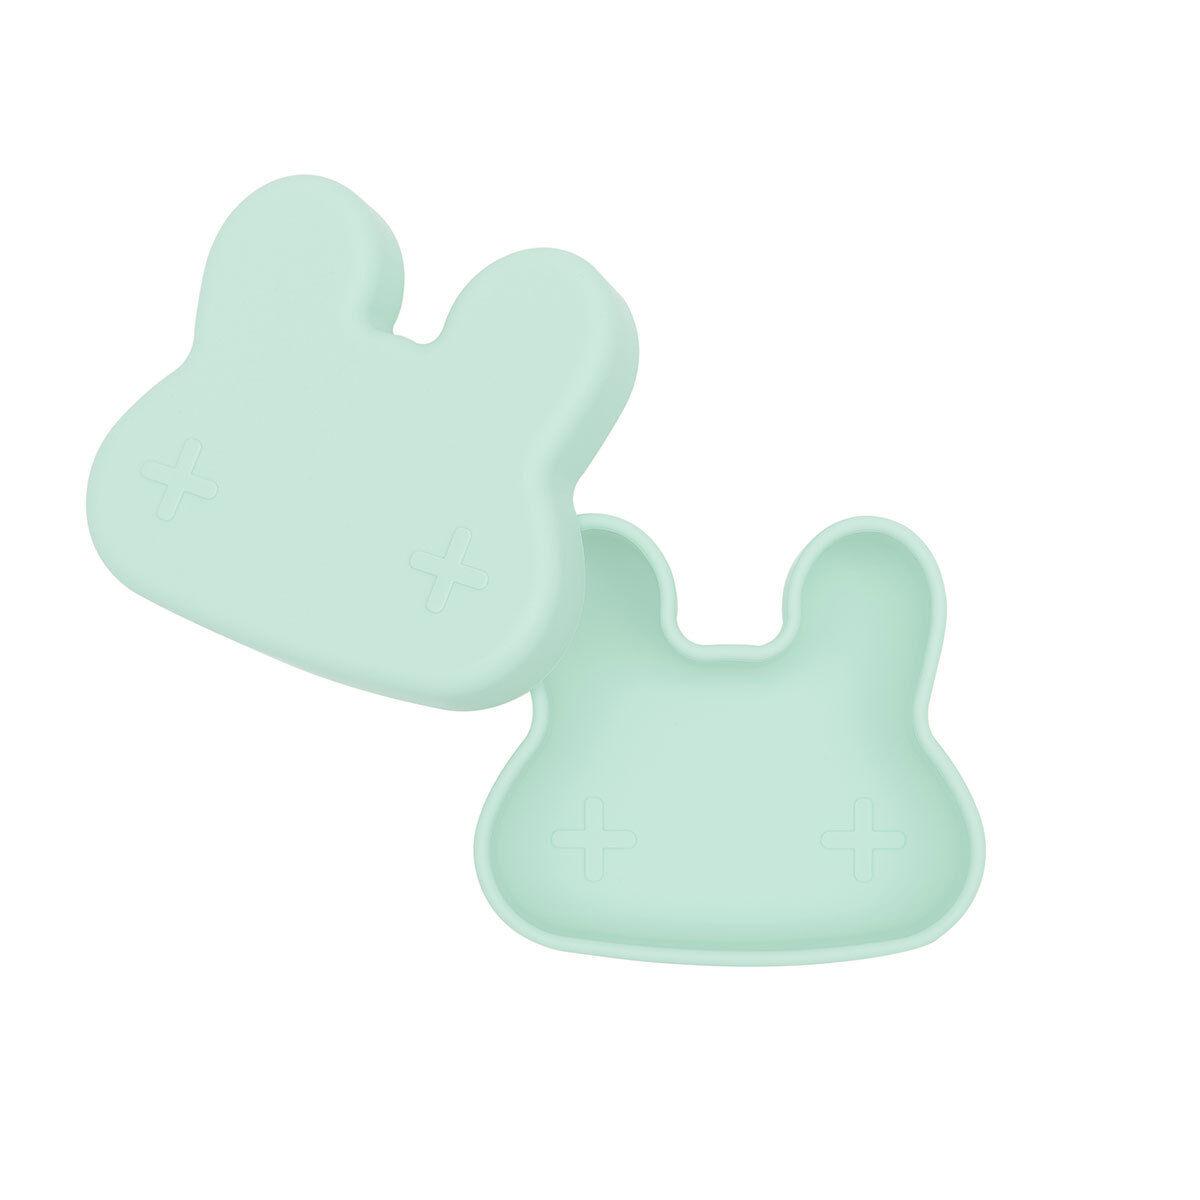 We Might Be Tiny Petite Boîte à Goûter Lapin - Minty Green